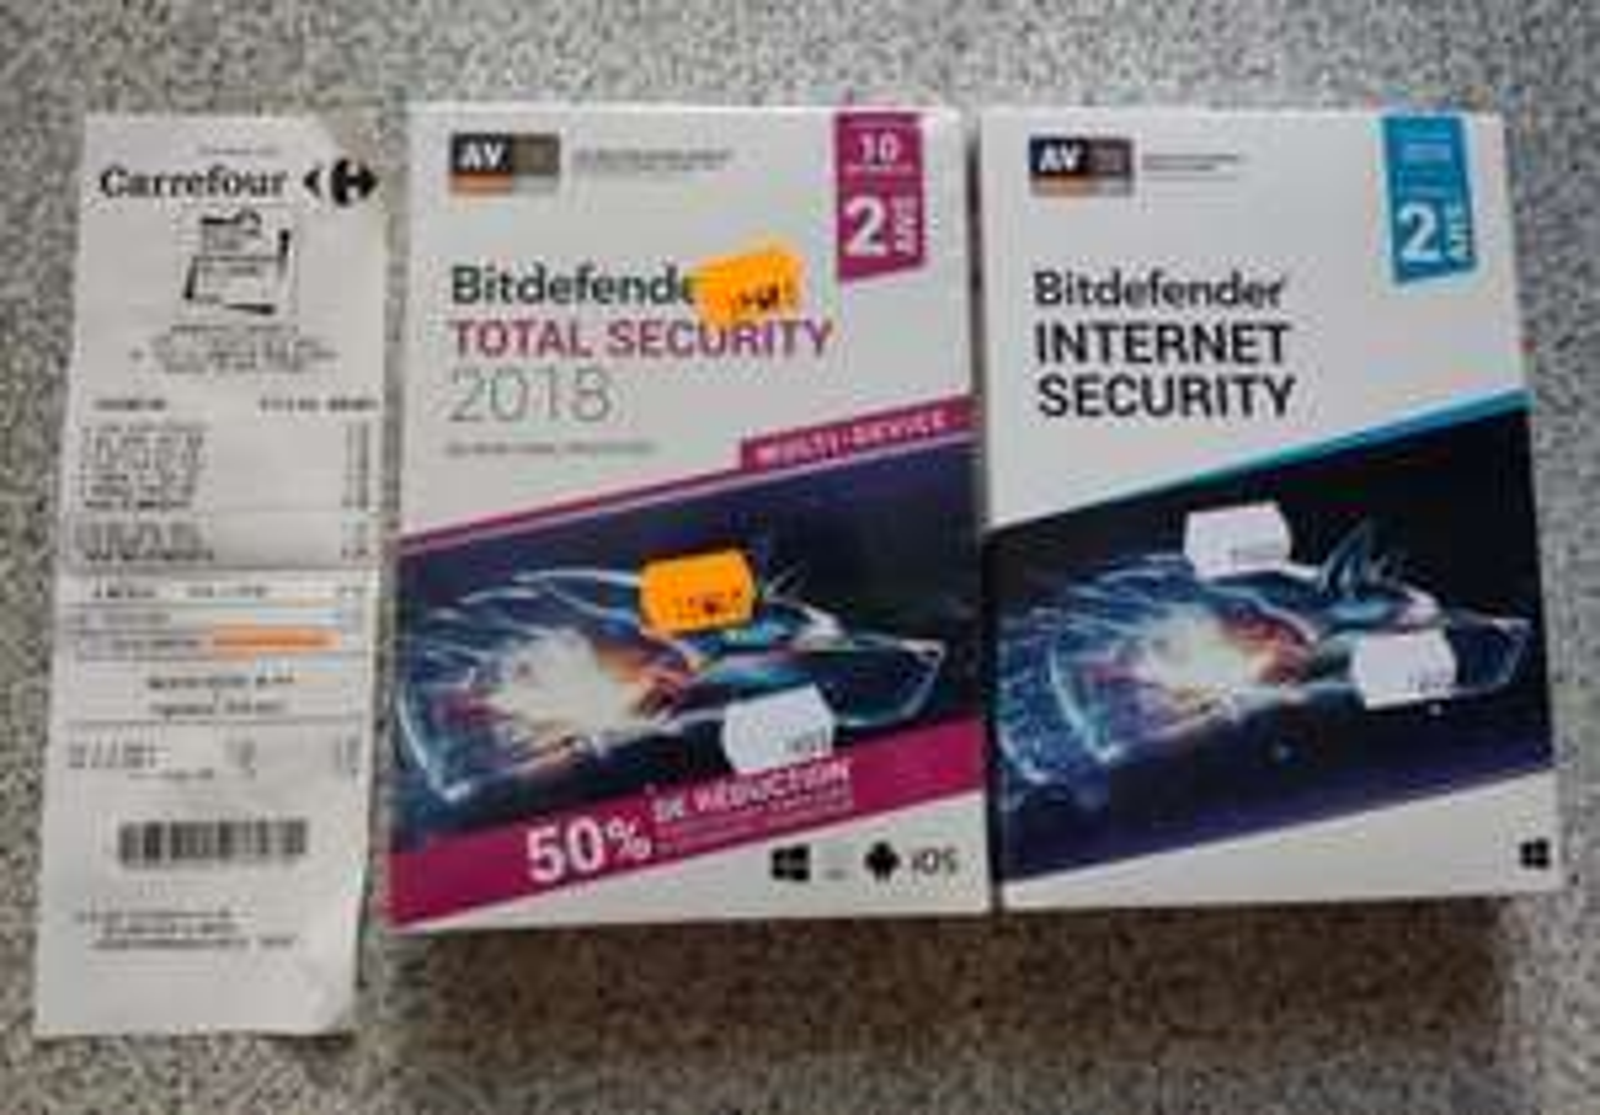 Antivirus Bitdefender Total security 10 appareils, 2 ans - Armentières 59